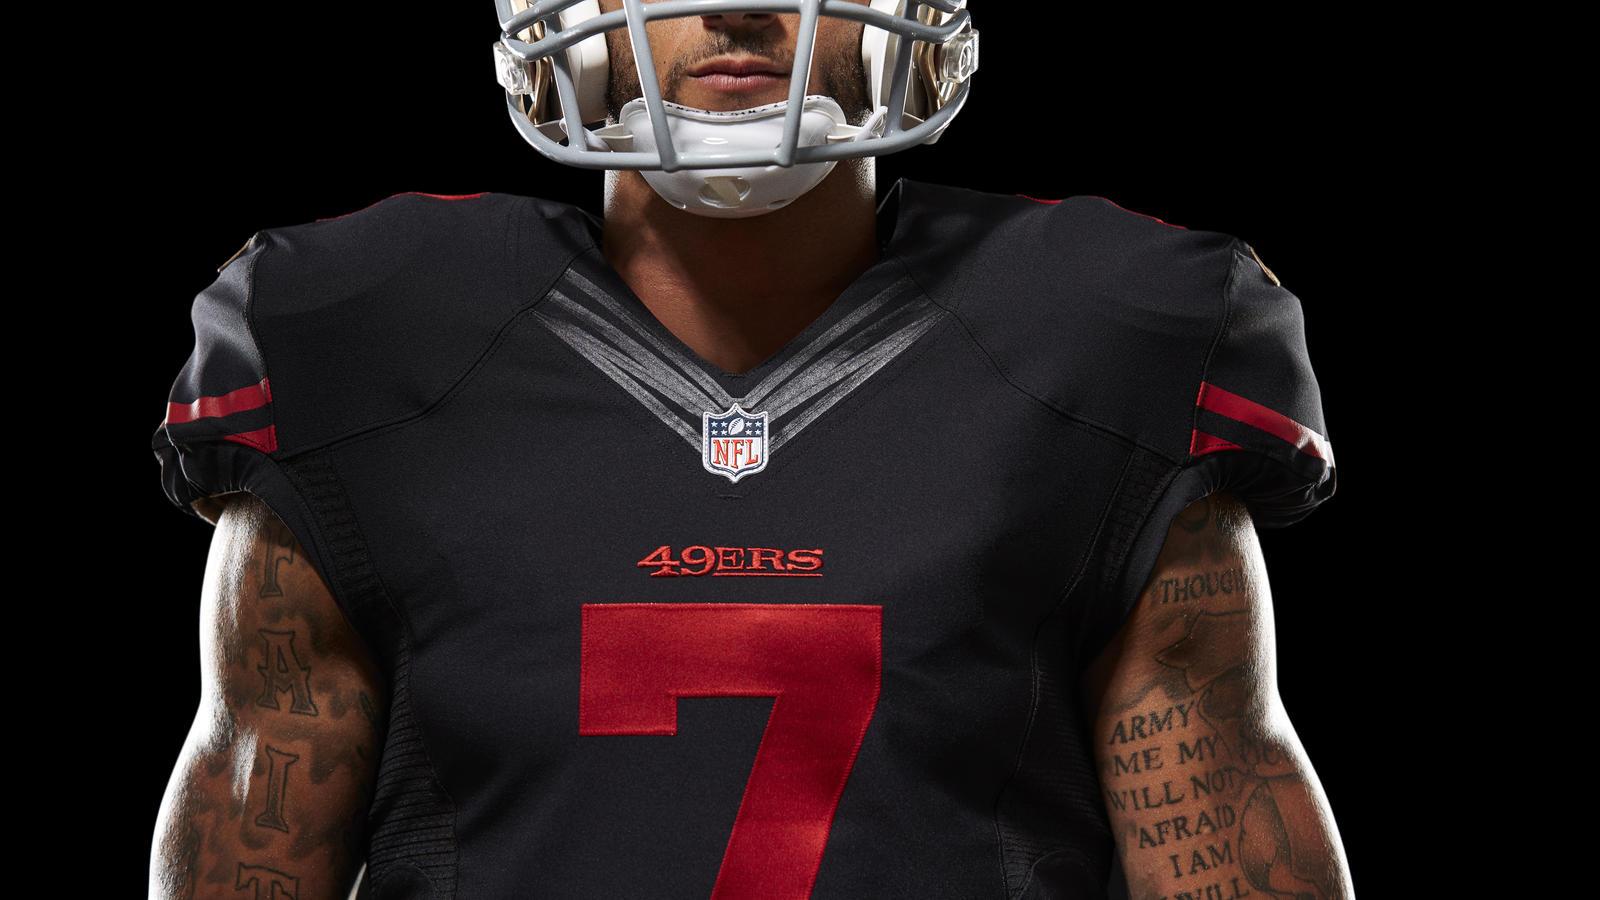 reputable site bb581 6dcb2 nike 49ers black jersey